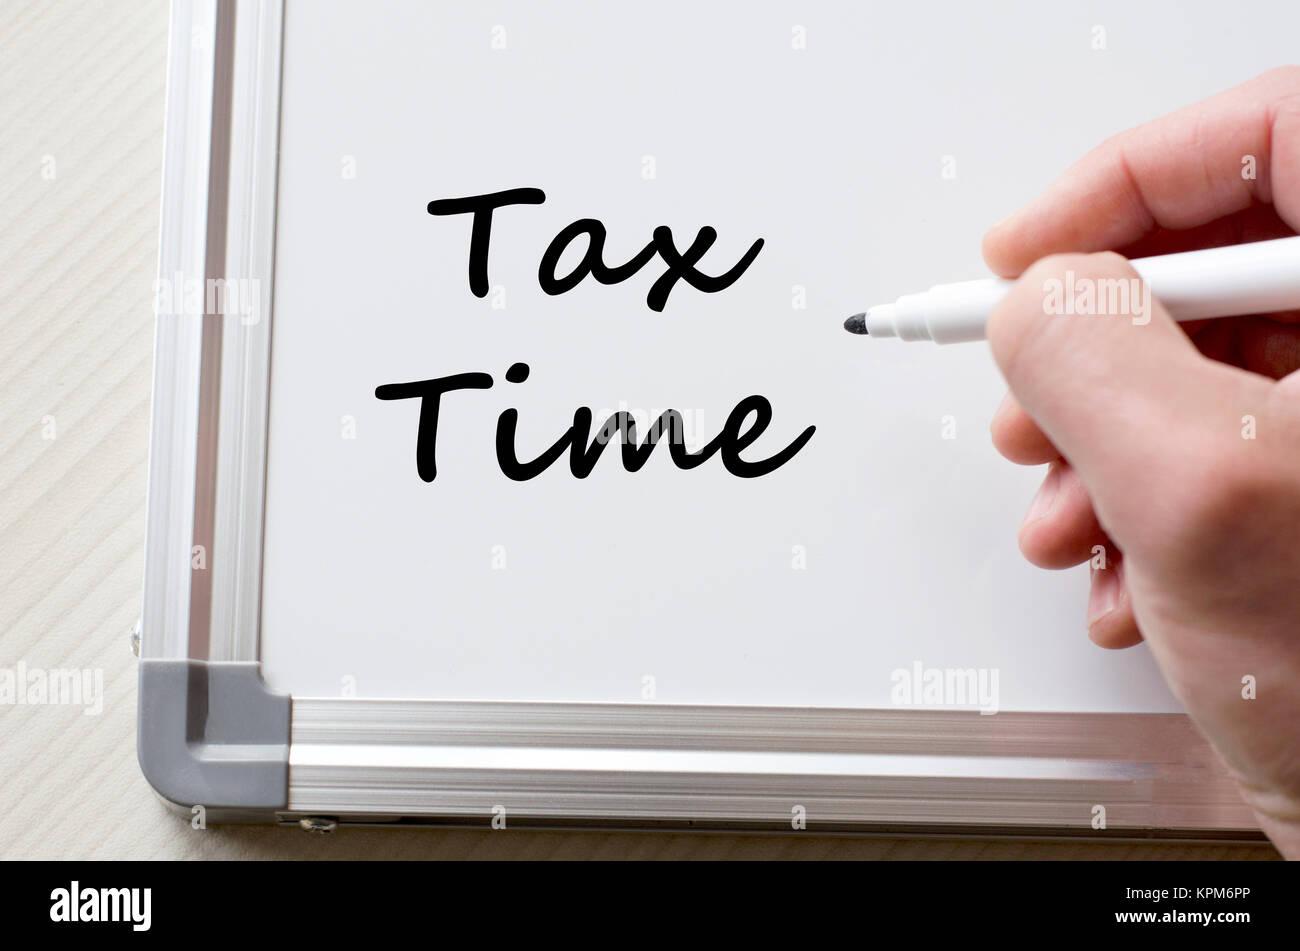 Tax time written on whiteboard - Stock Image